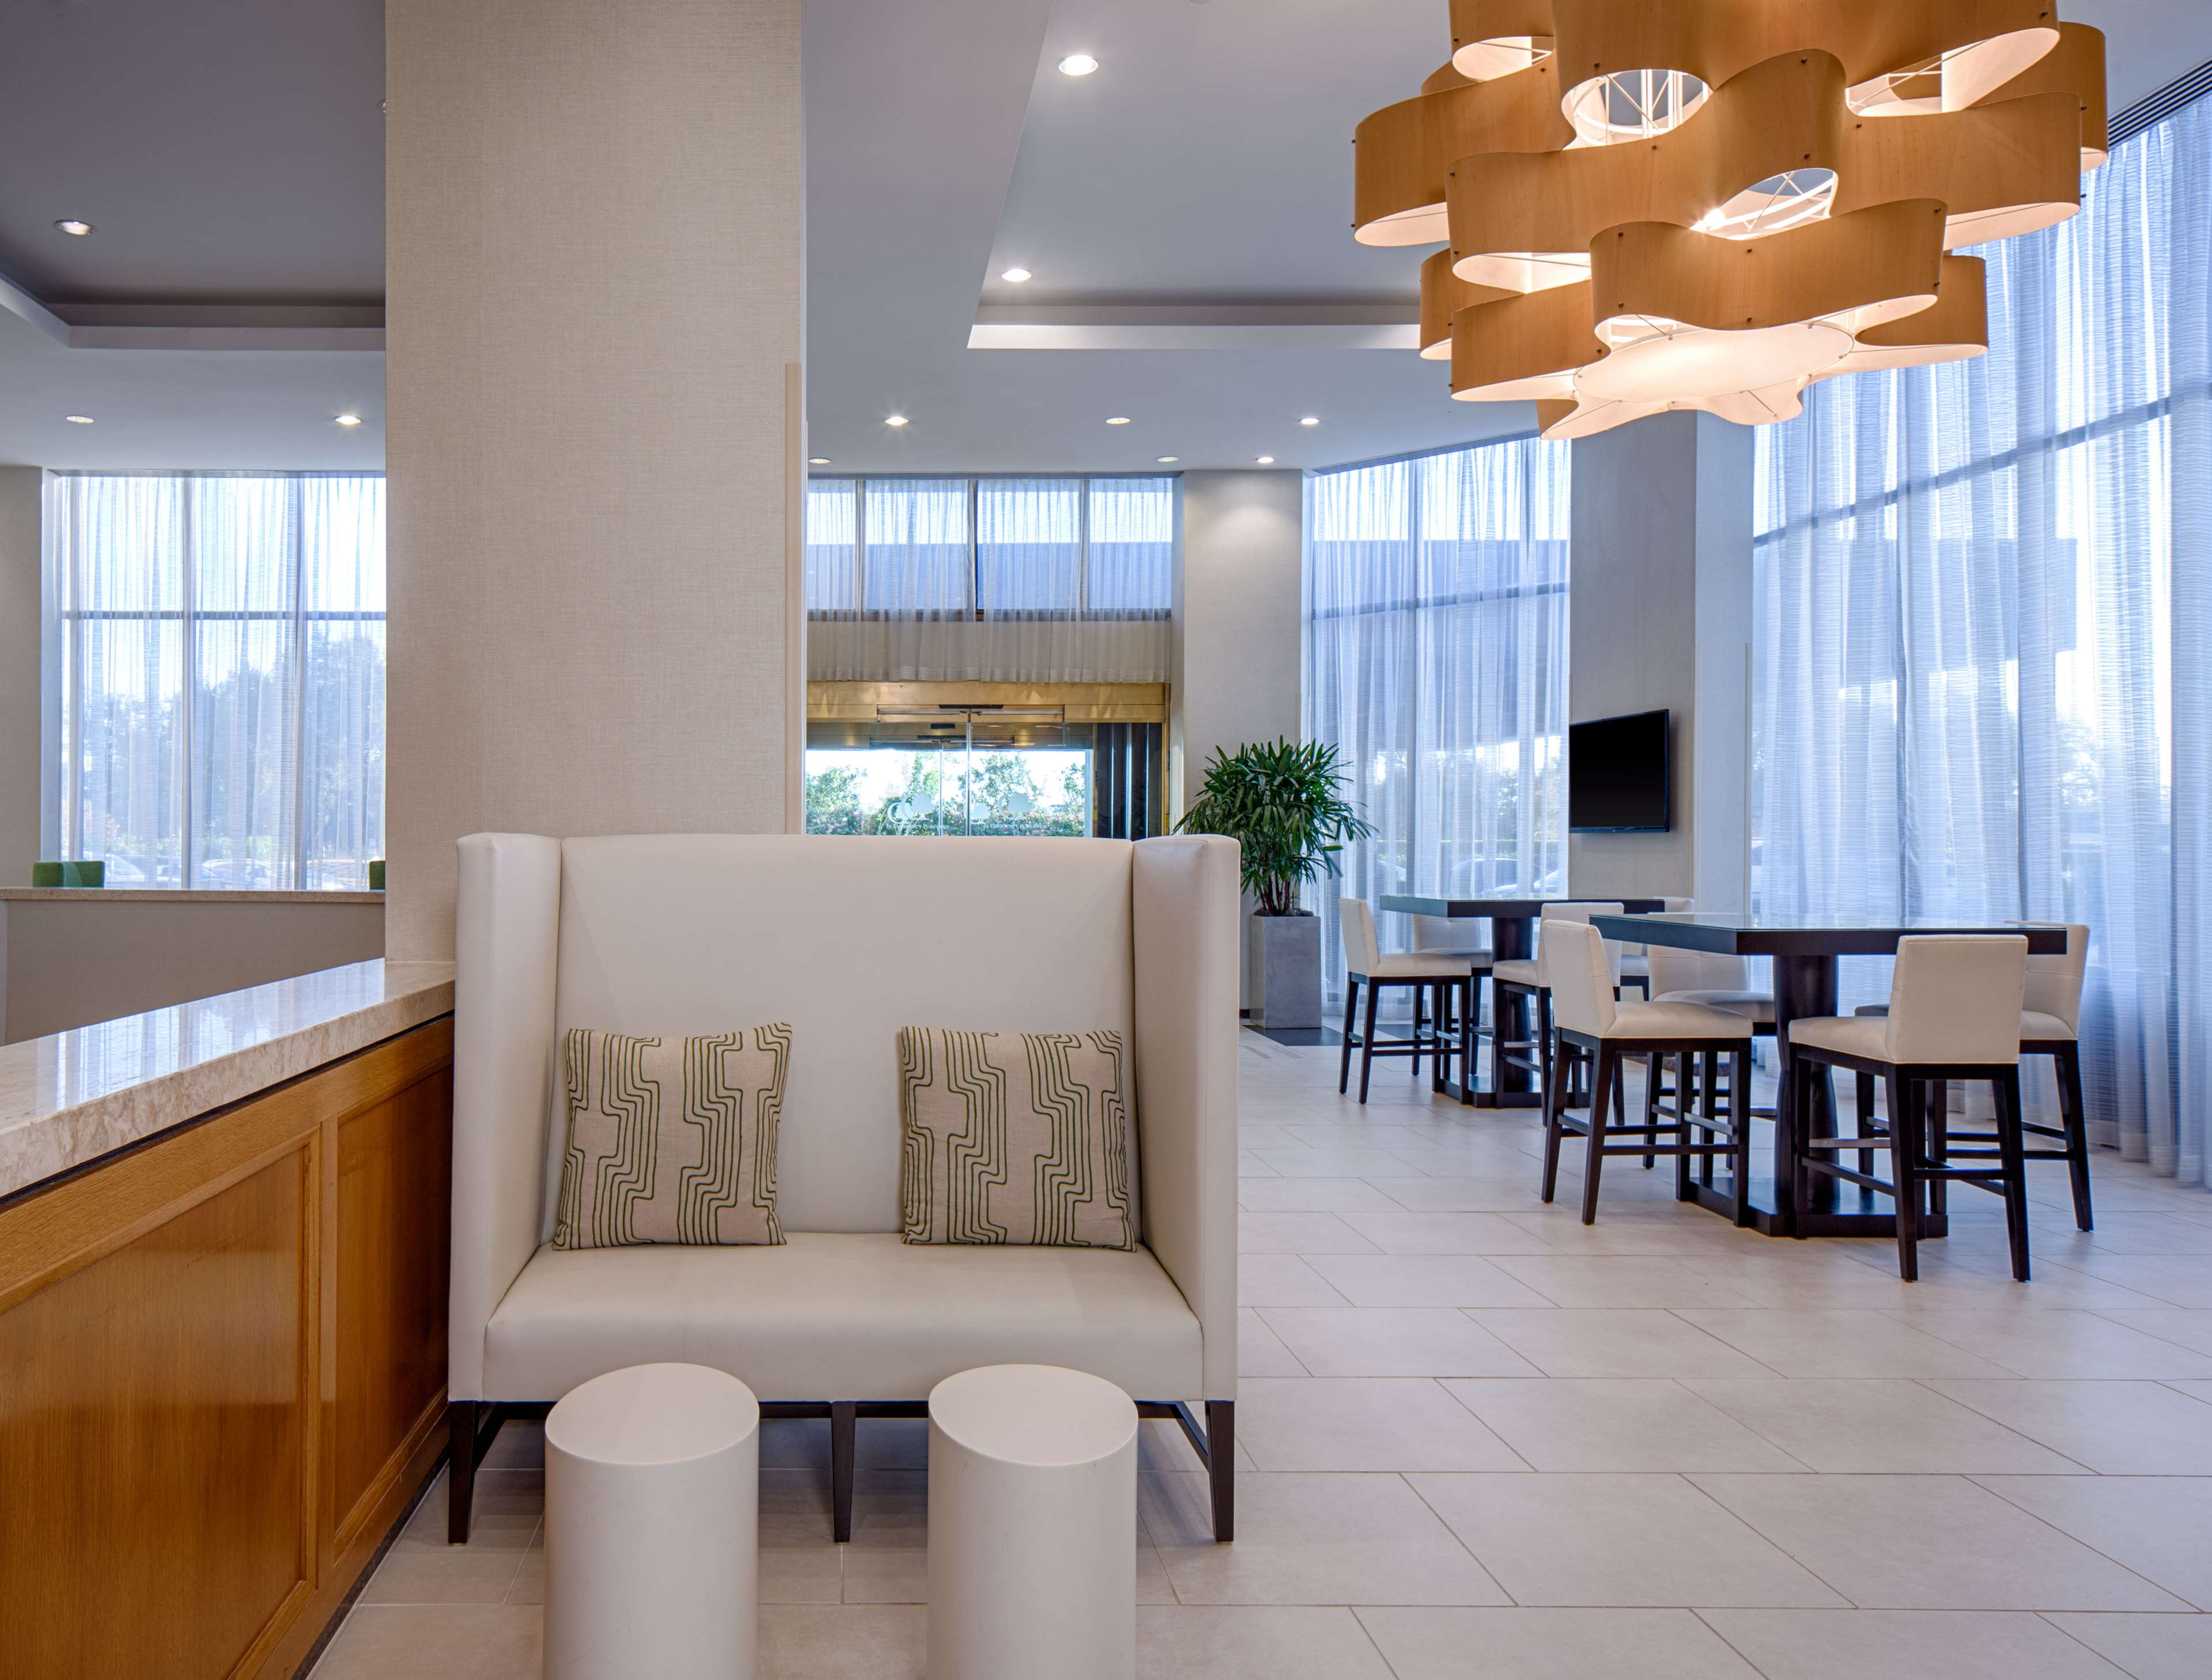 DoubleTree by Hilton Hotel Houston - Greenway Plaza image 4